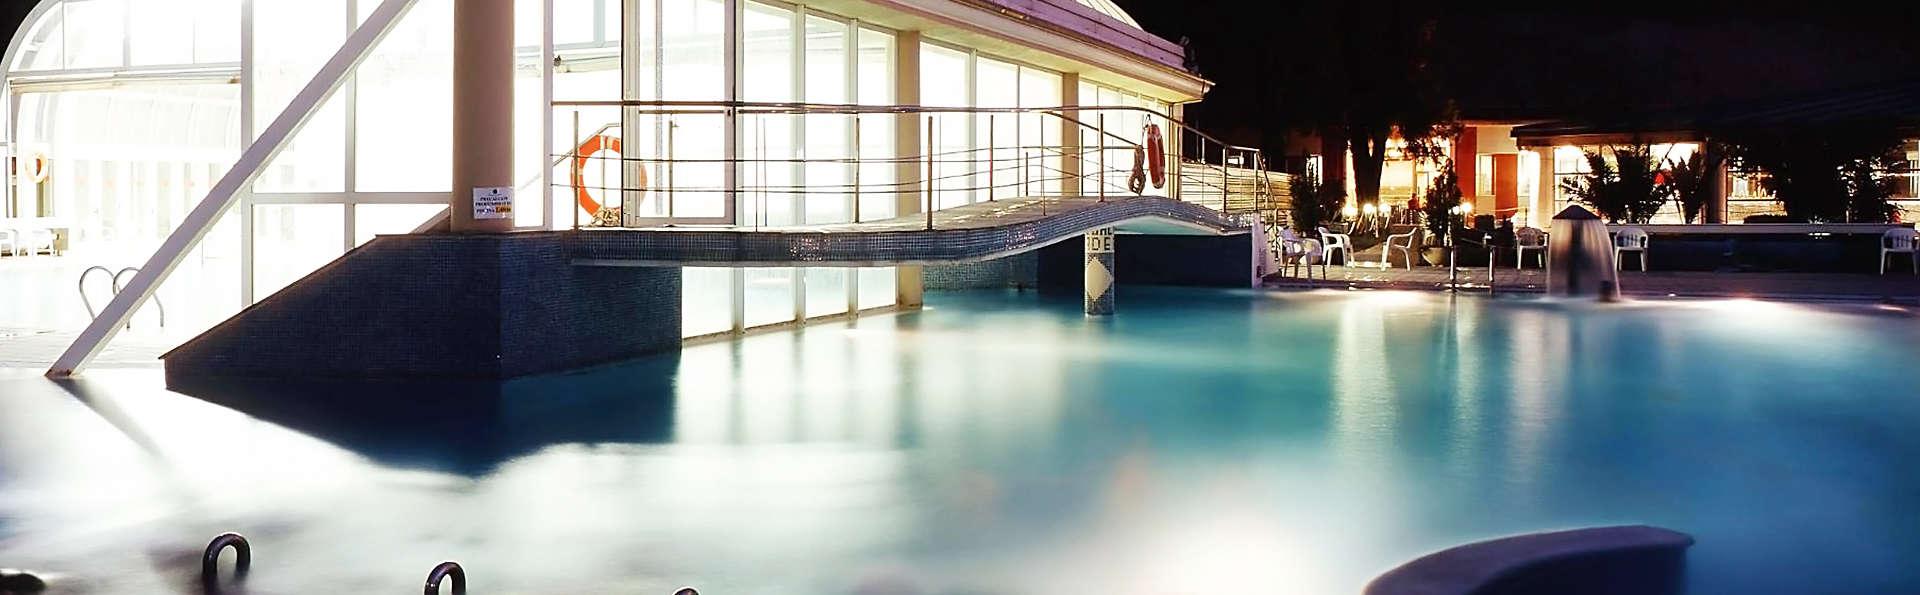 Hotel Arco de San Juan - EDIT_pool.jpg